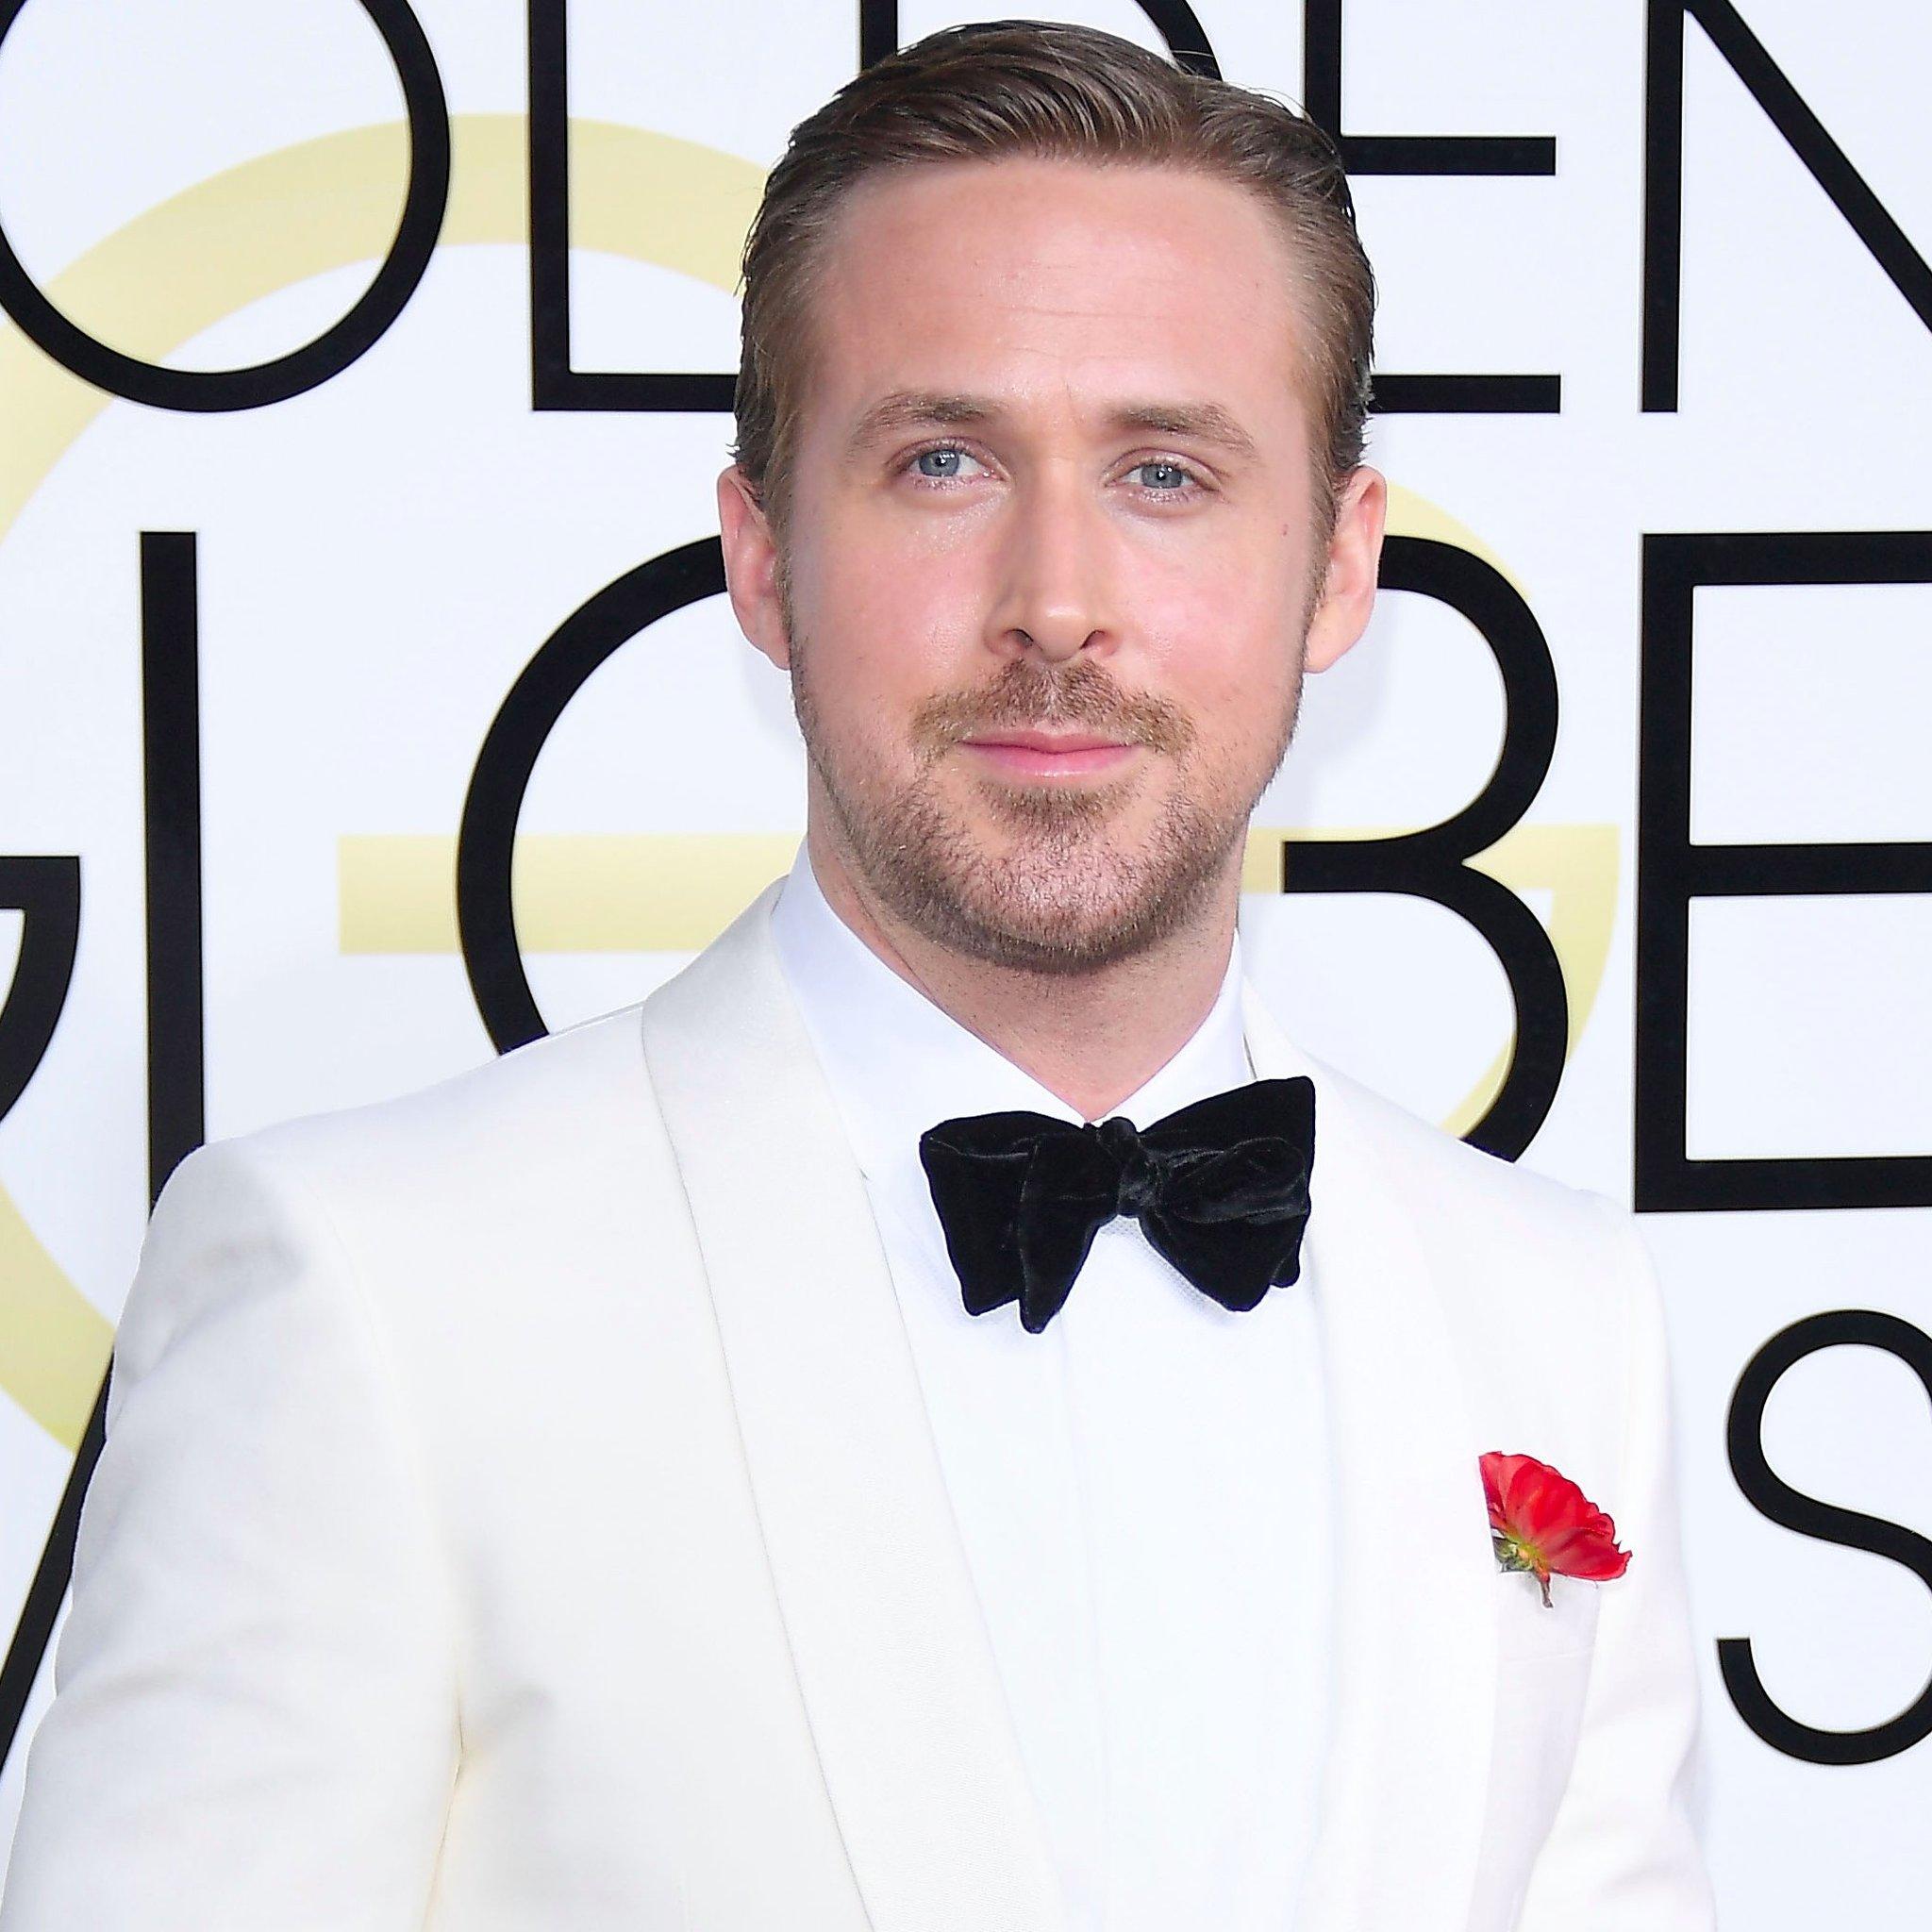 Ryan-Gosling-dan-steven-hollywood-hairstyles-2017-celebrity-best-actor-slick-with-side-part-2017